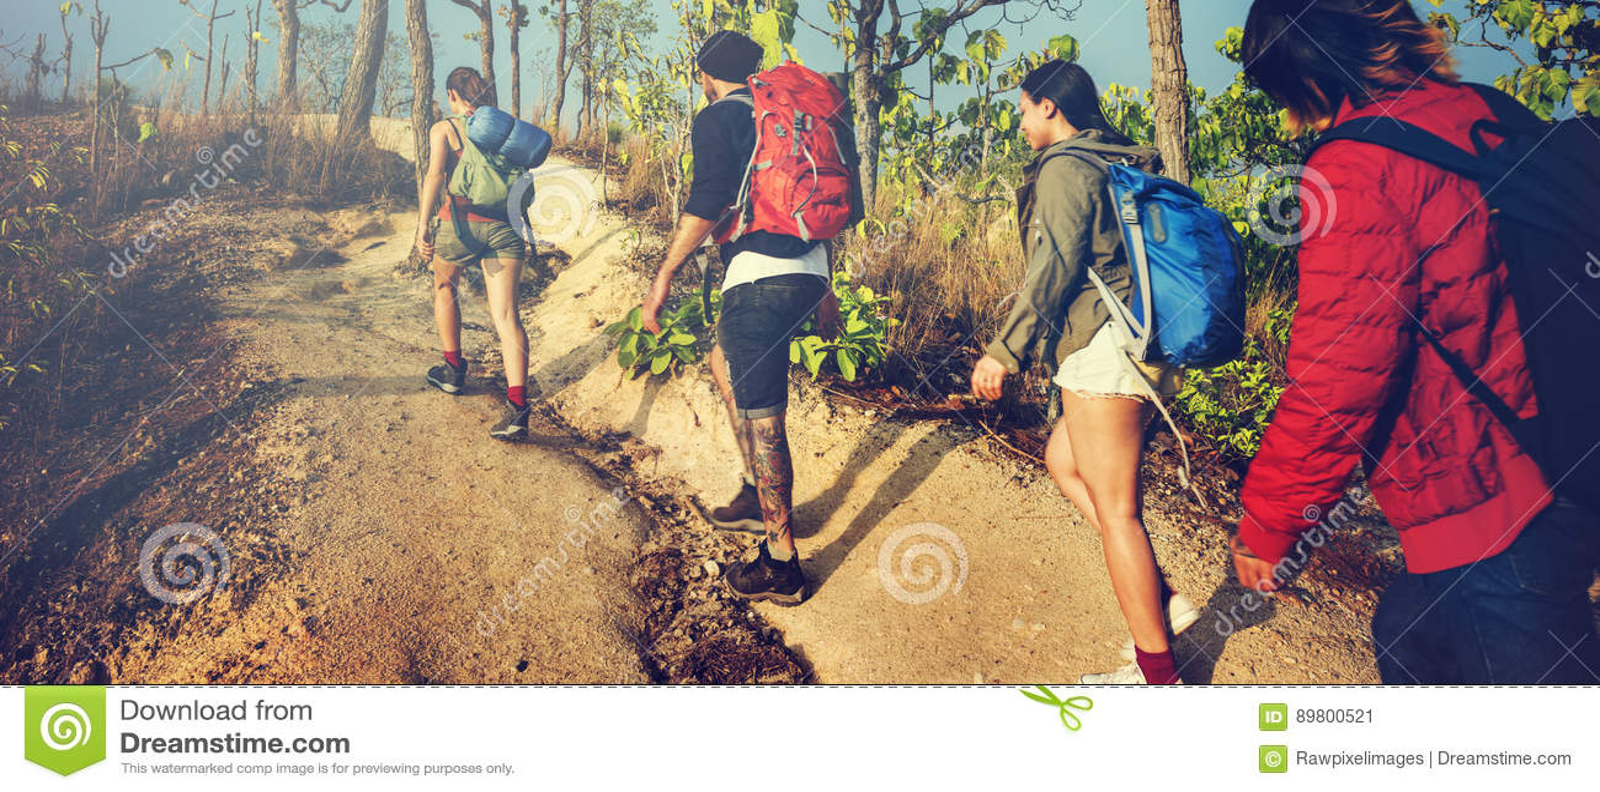 Wanderer, der Reise-Reise-Wanderungs-Konzept wandernd kampiert